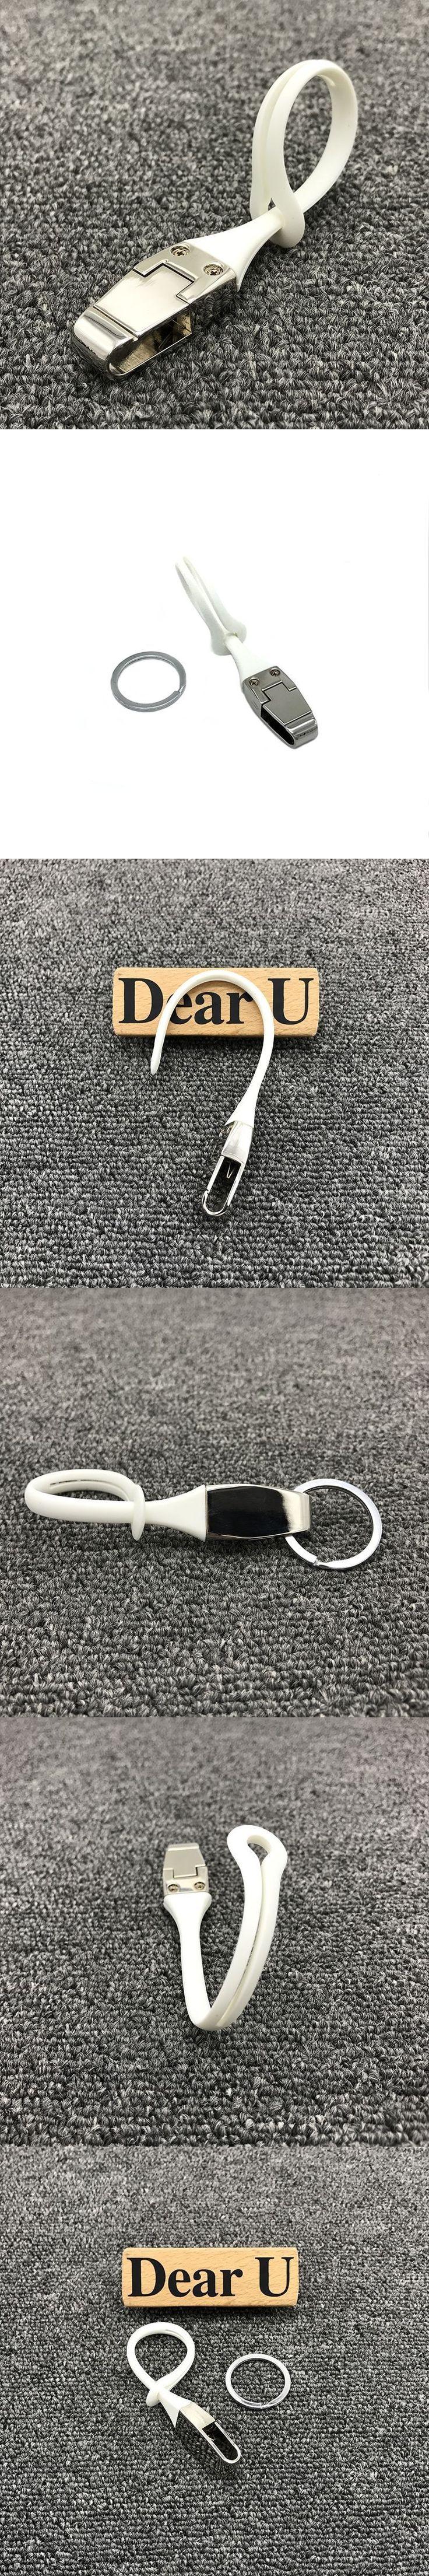 Vintage Denmark Car Metal Key Chain keychain Holder Organizer For VW Kia BMW Audi Mitsubishi Hyundai Peugeot Honda Mercedes BENZ #bmwvintagecars #mercedesvintagecars